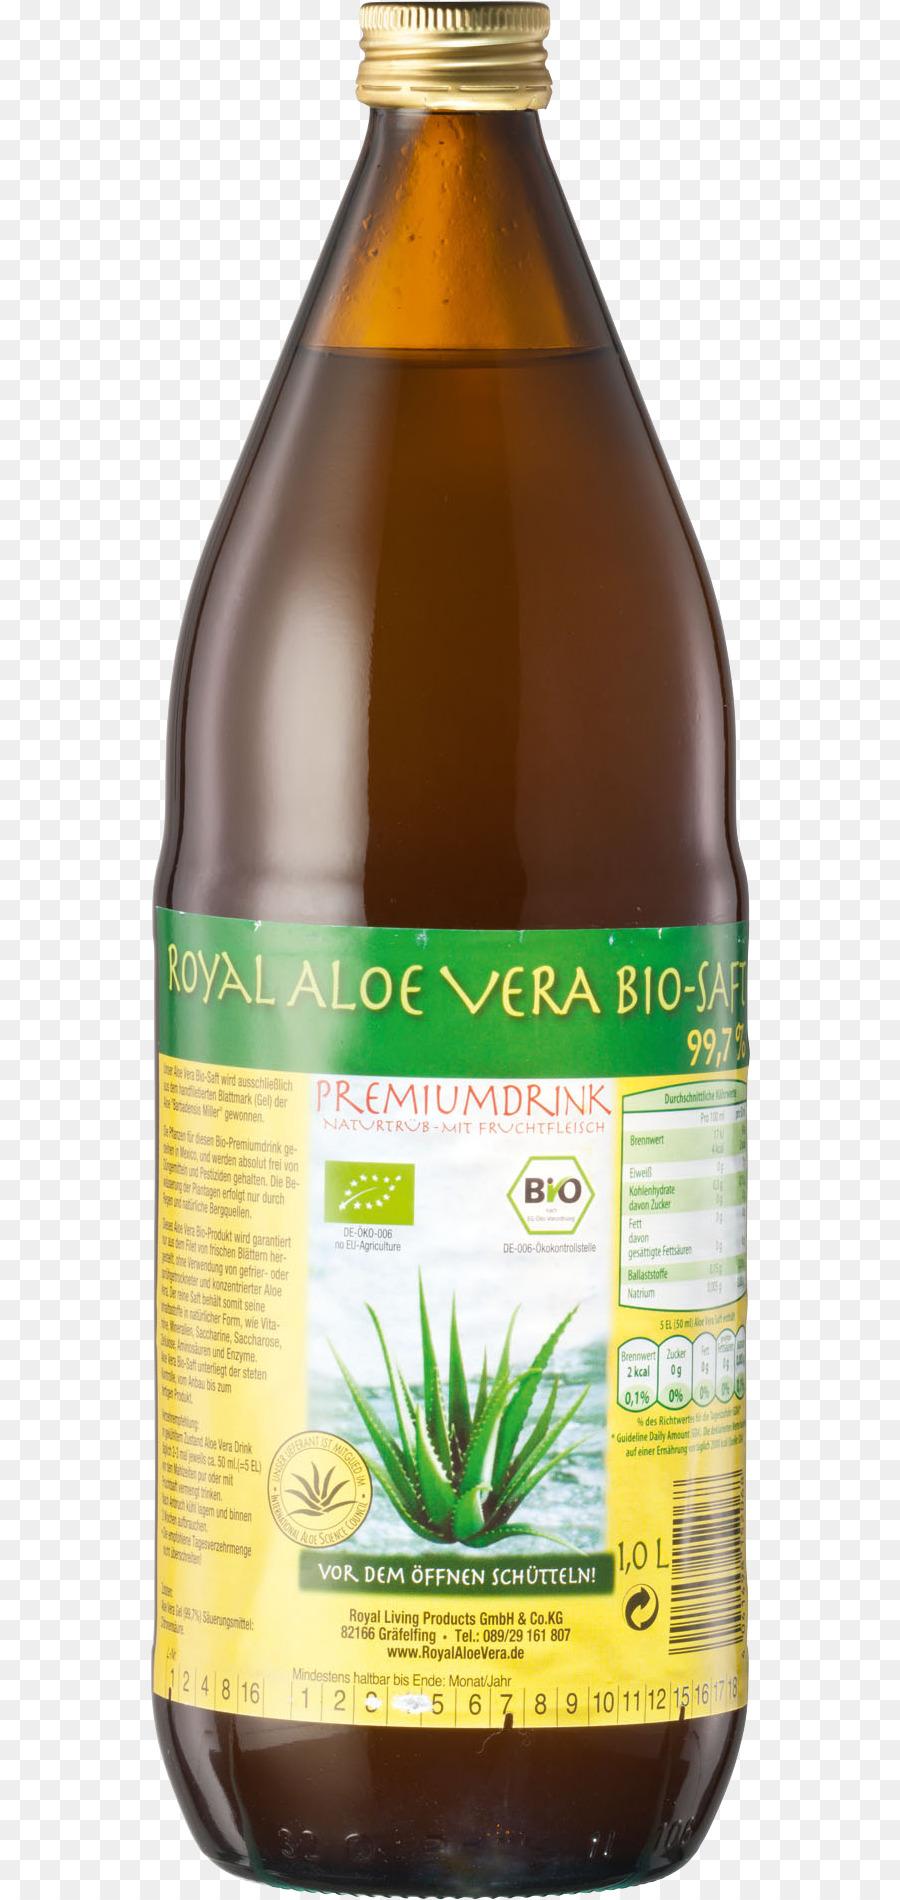 Aloe Vera Png Download 600 1900 Free Transparent Sales Quote Png Download Cleanpng Kisspng